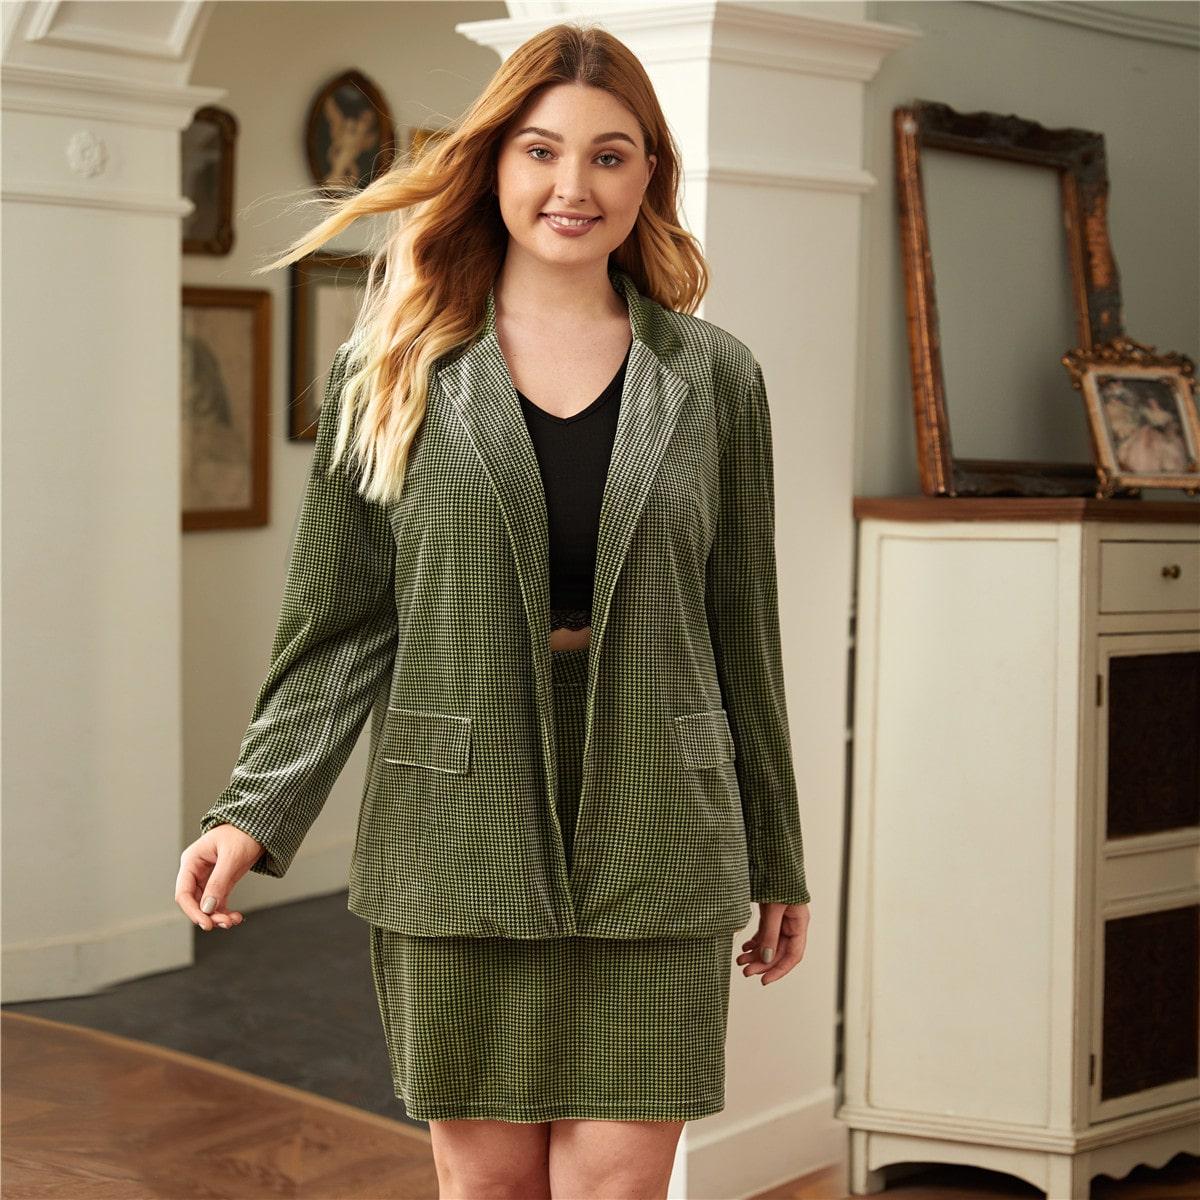 Plus Notched Collar Houndstooth Velvet Blazer & Skirt Set, SHEIN  - buy with discount